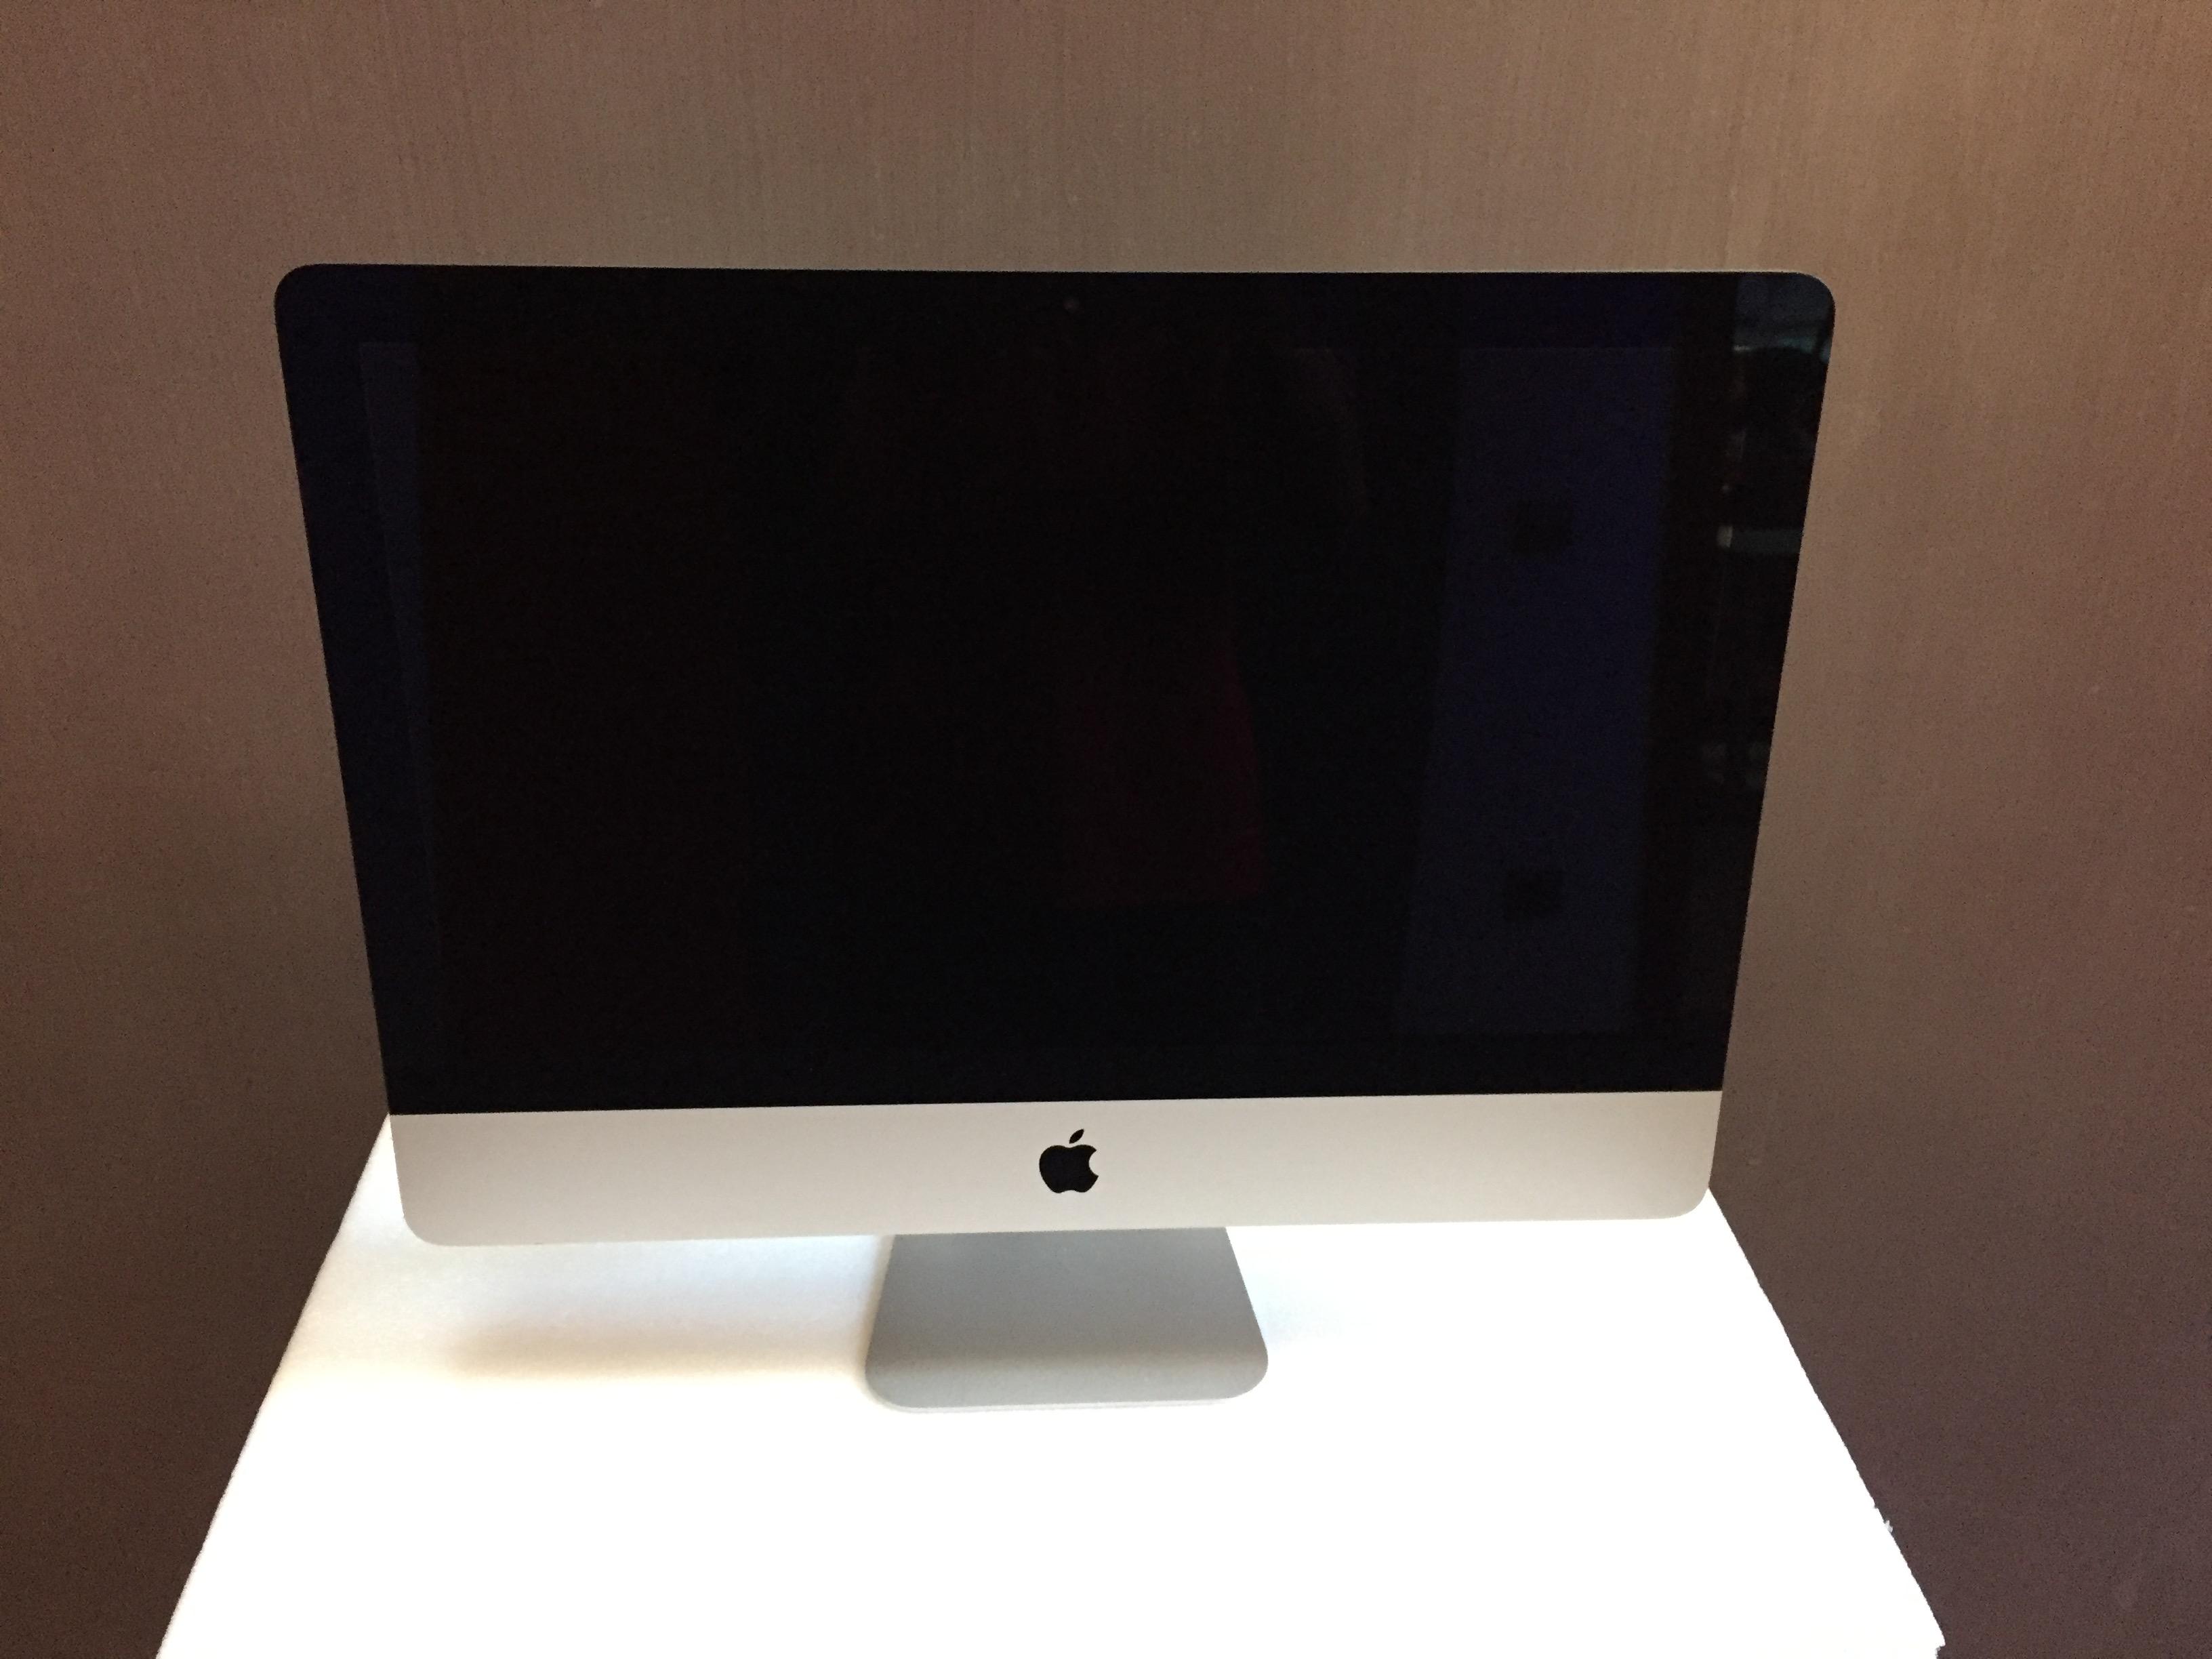 iMac 21.5-inch, Intel Core i5 1,4 GHz, 8 GB, 500 GB, imagen 1